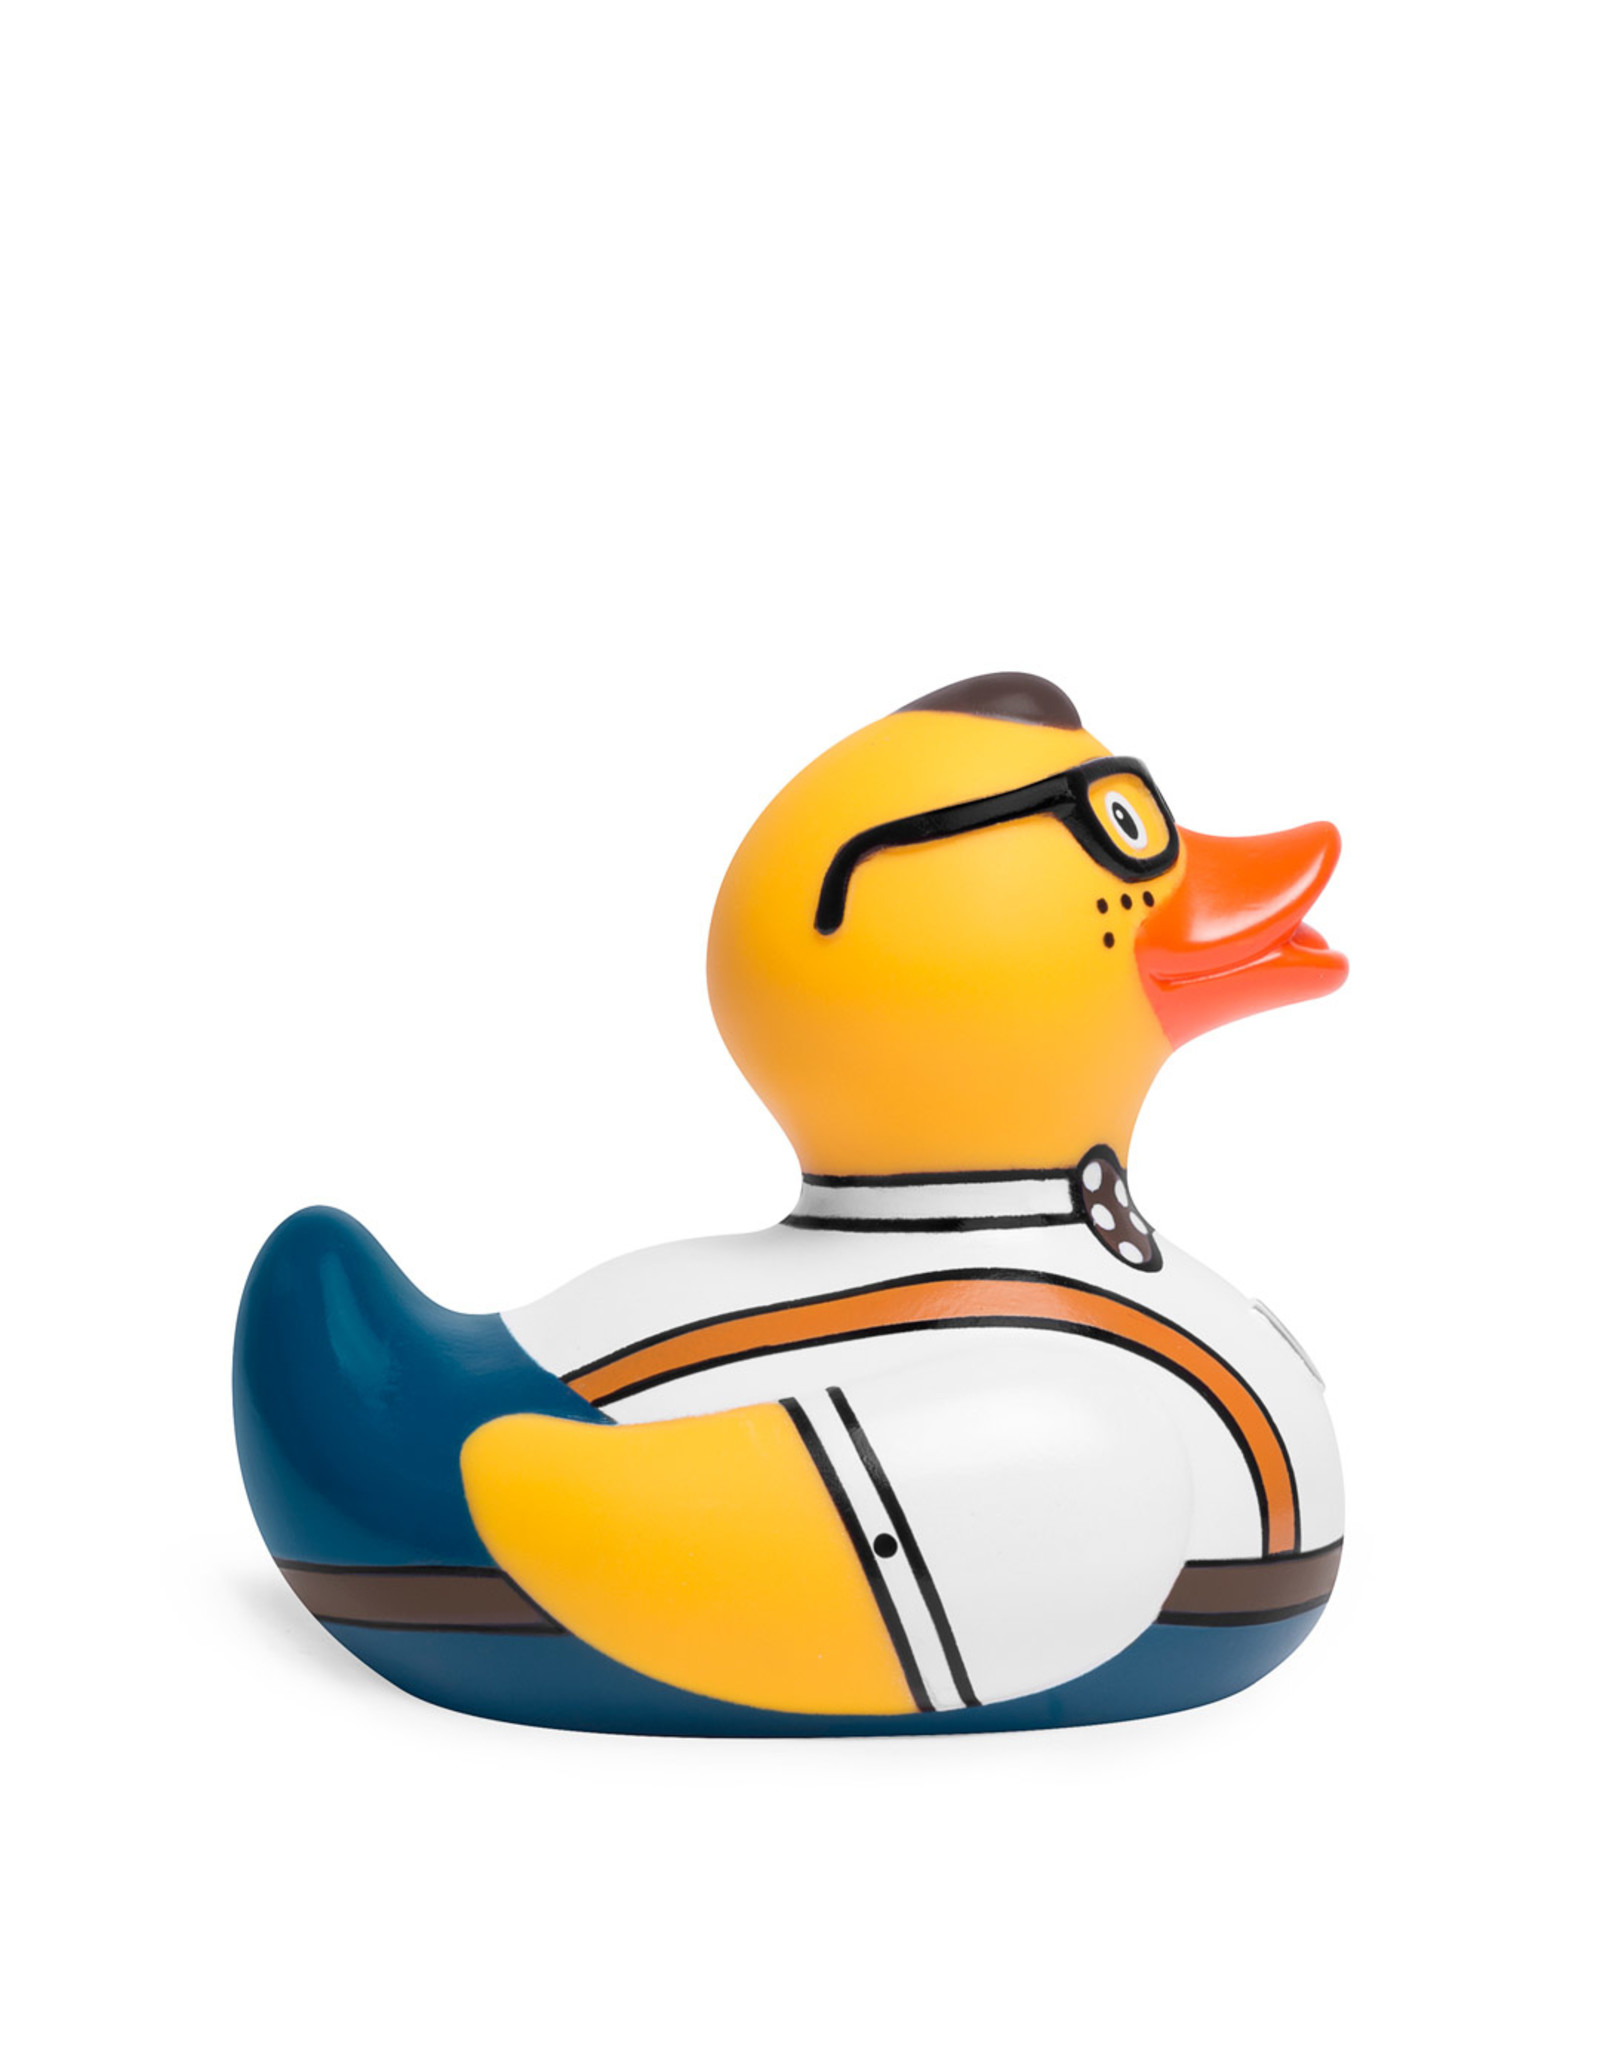 Nerd Rubber Duck